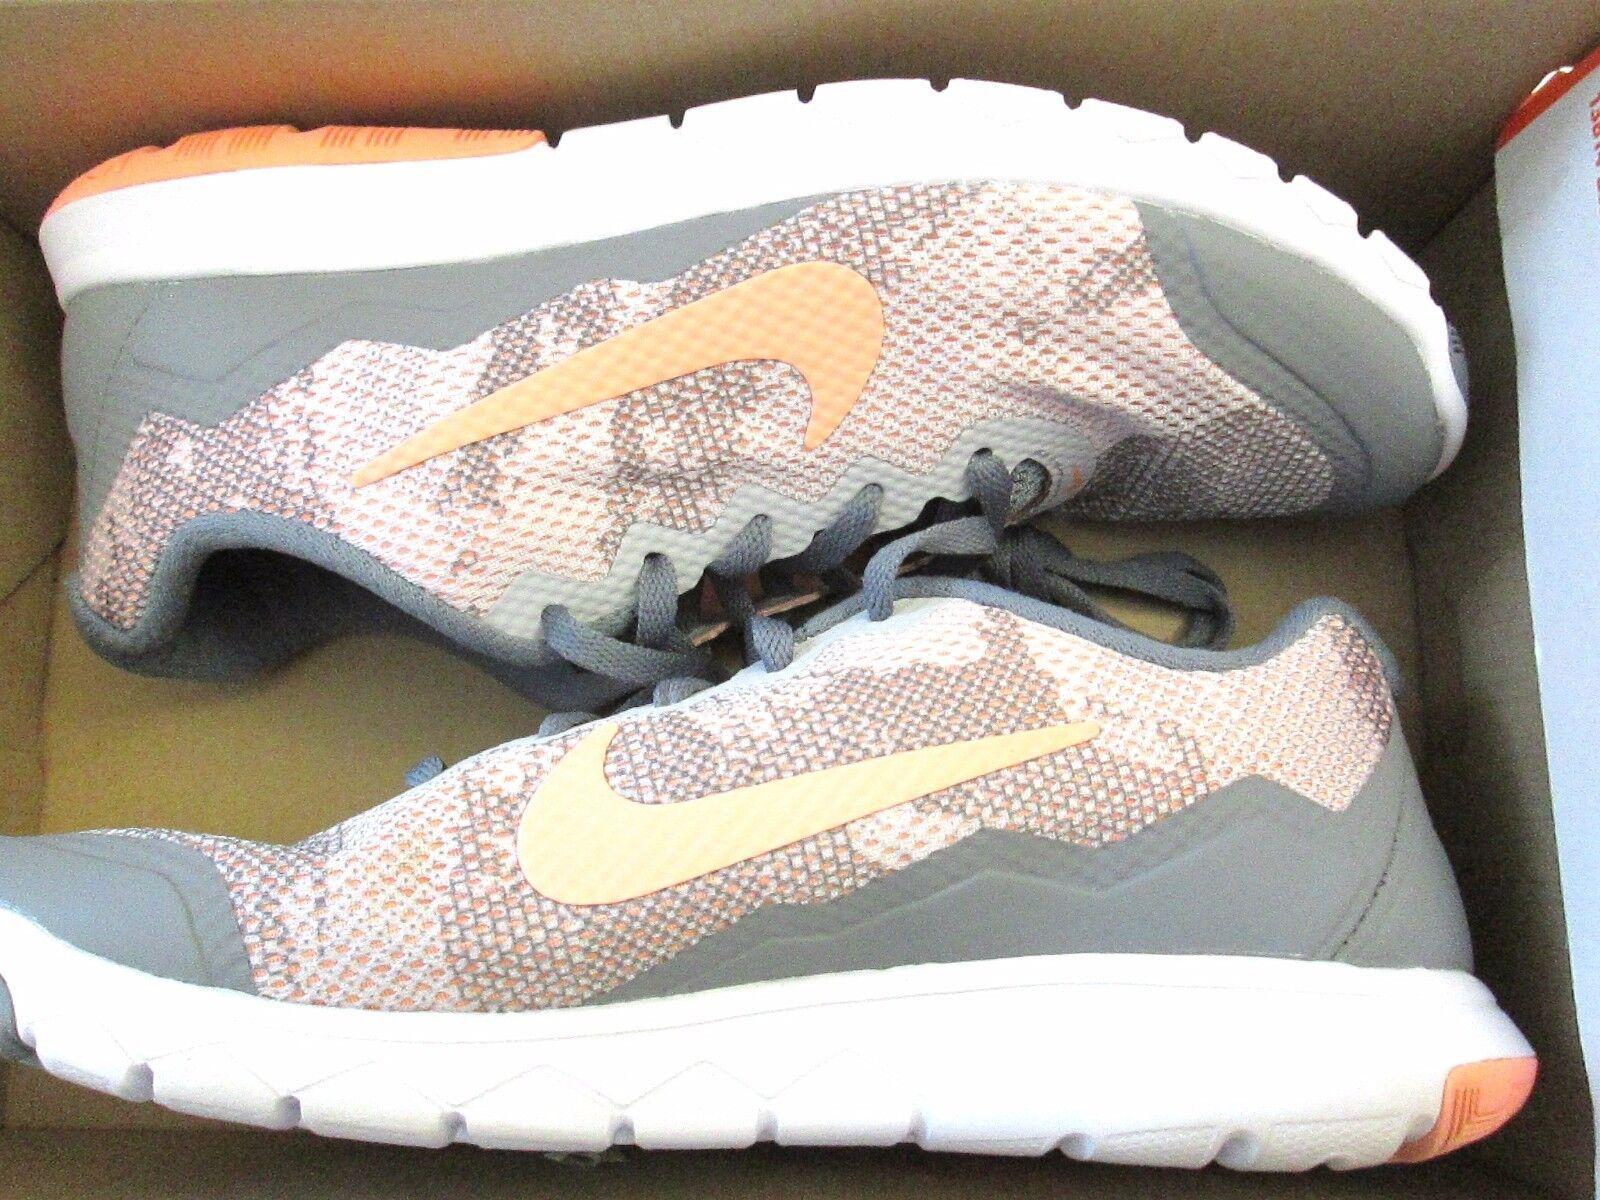 nike womens flex rn 4 prem rosa sportliche sneakers grau / rosa prem 749177 001 7 (6,5). f4733e